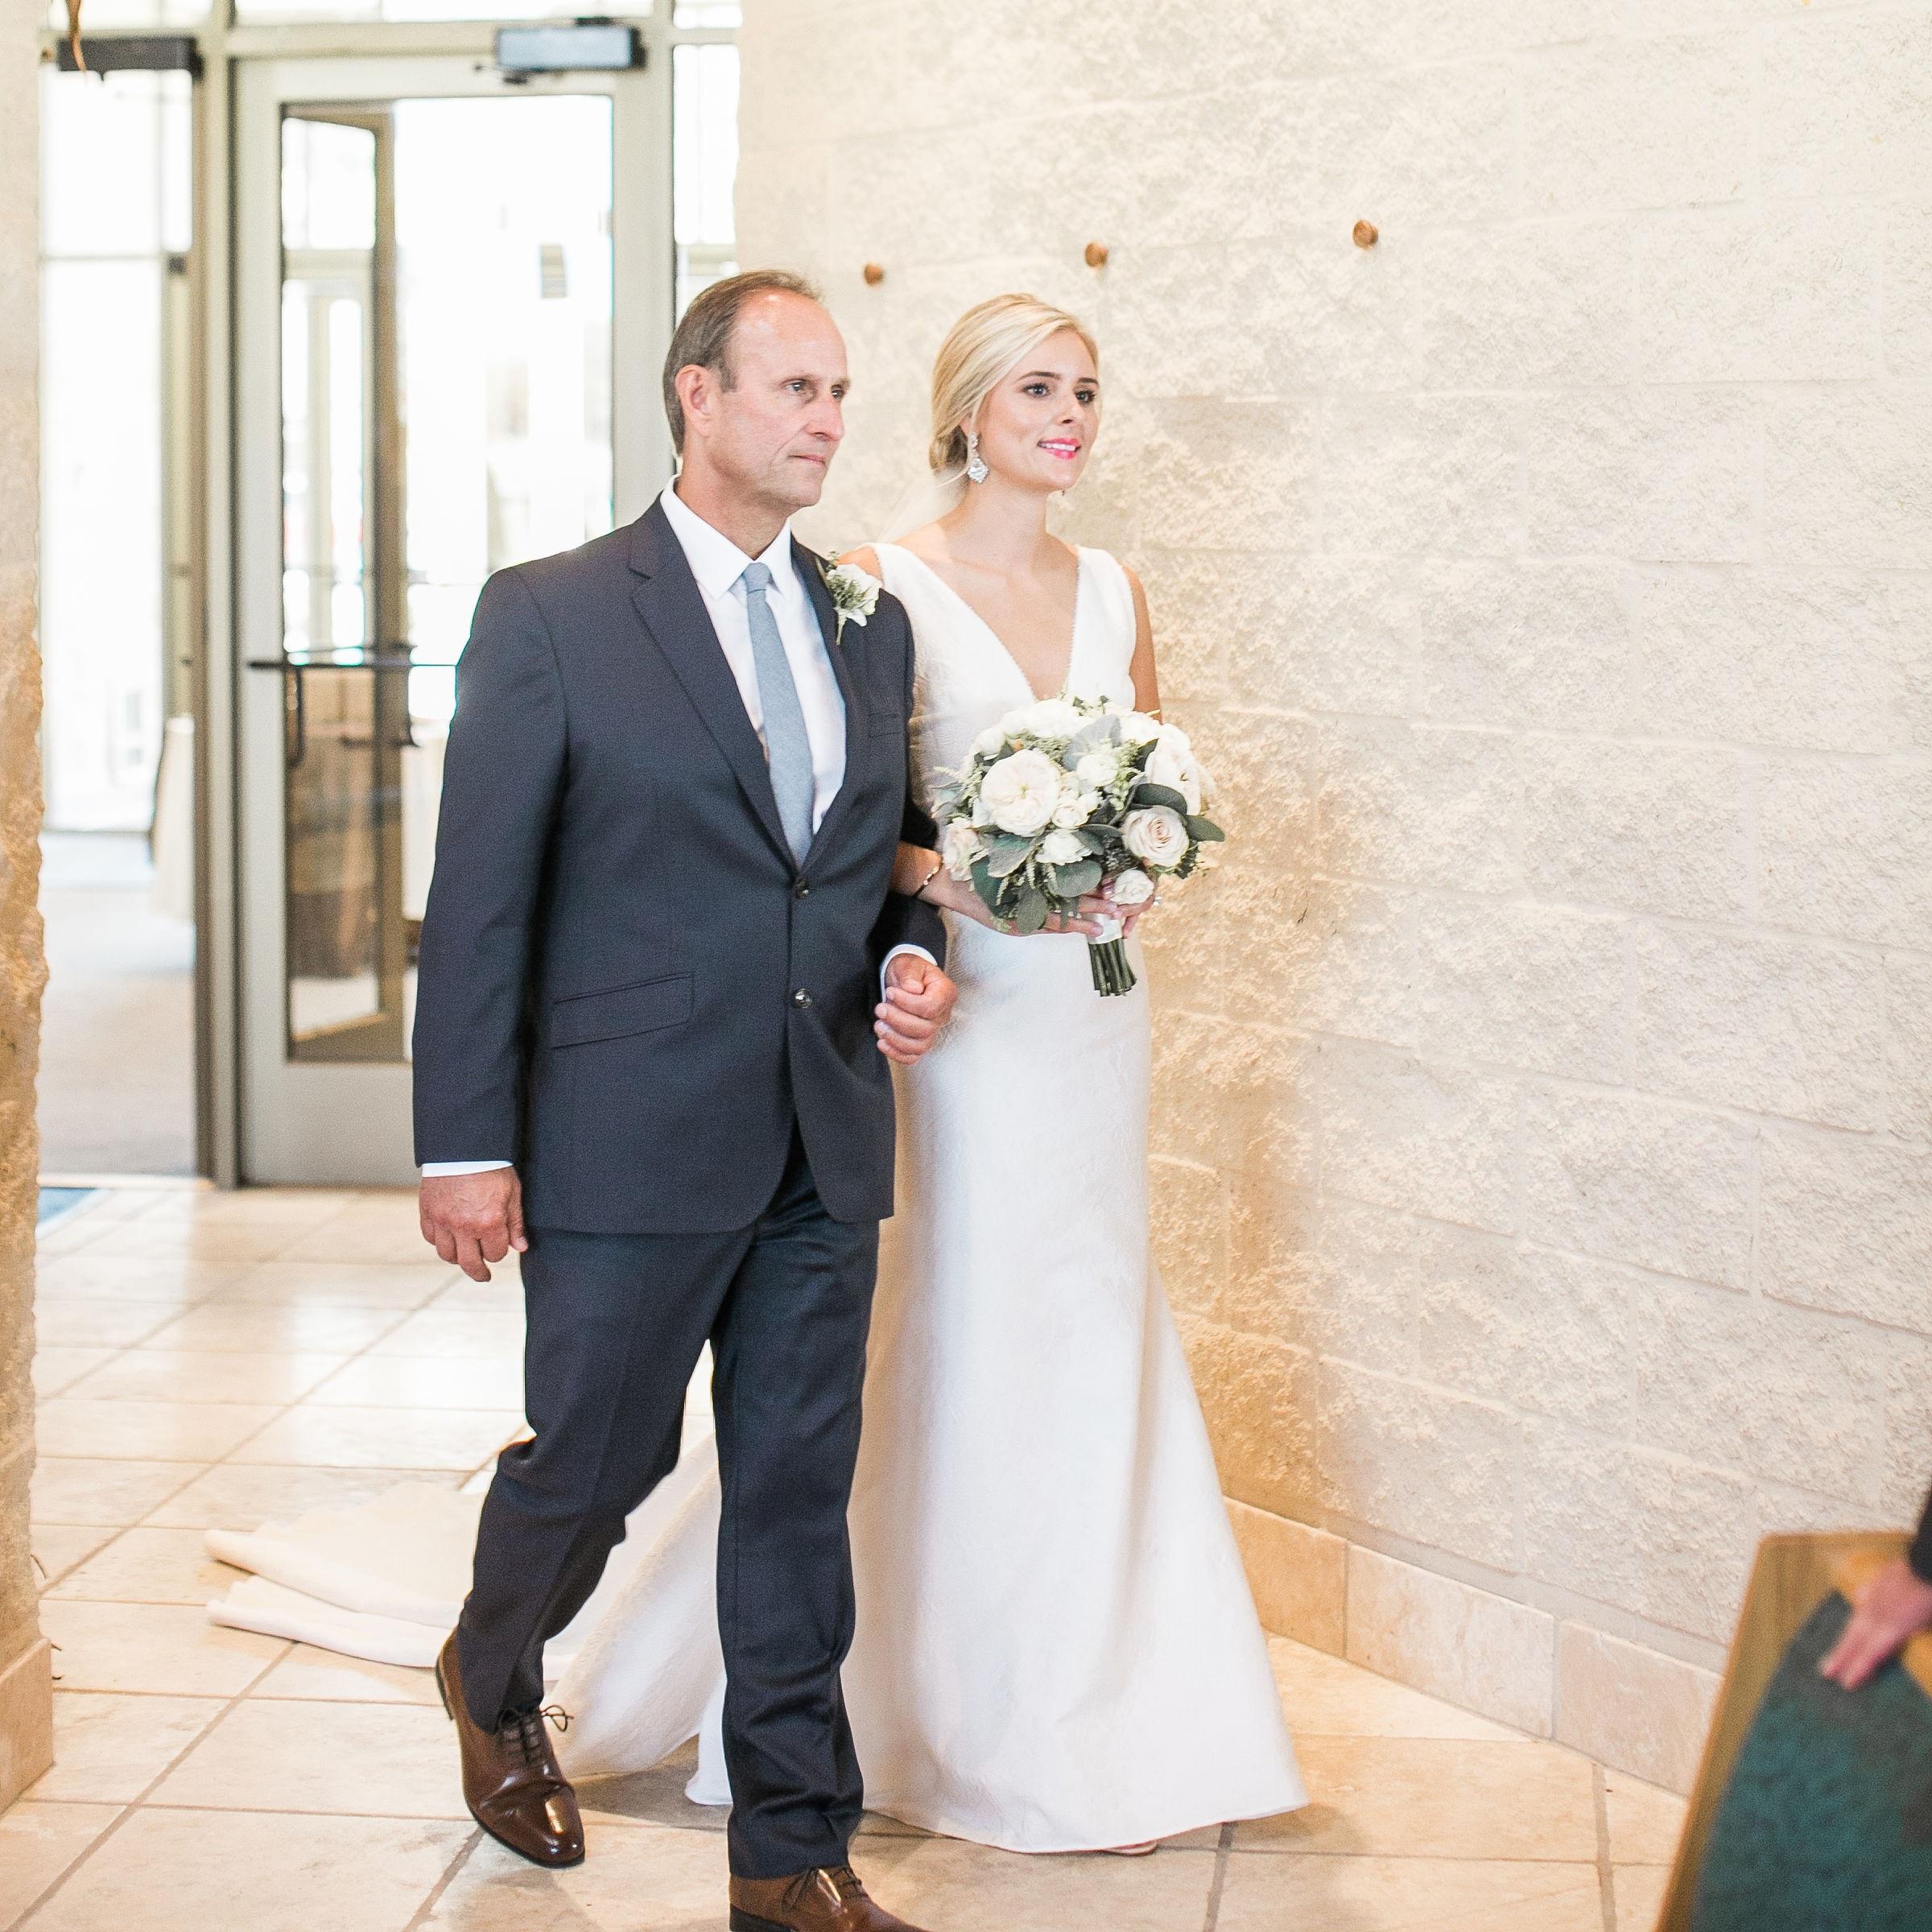 Wedding-Ceremony-Ivory+Bliss-Photography